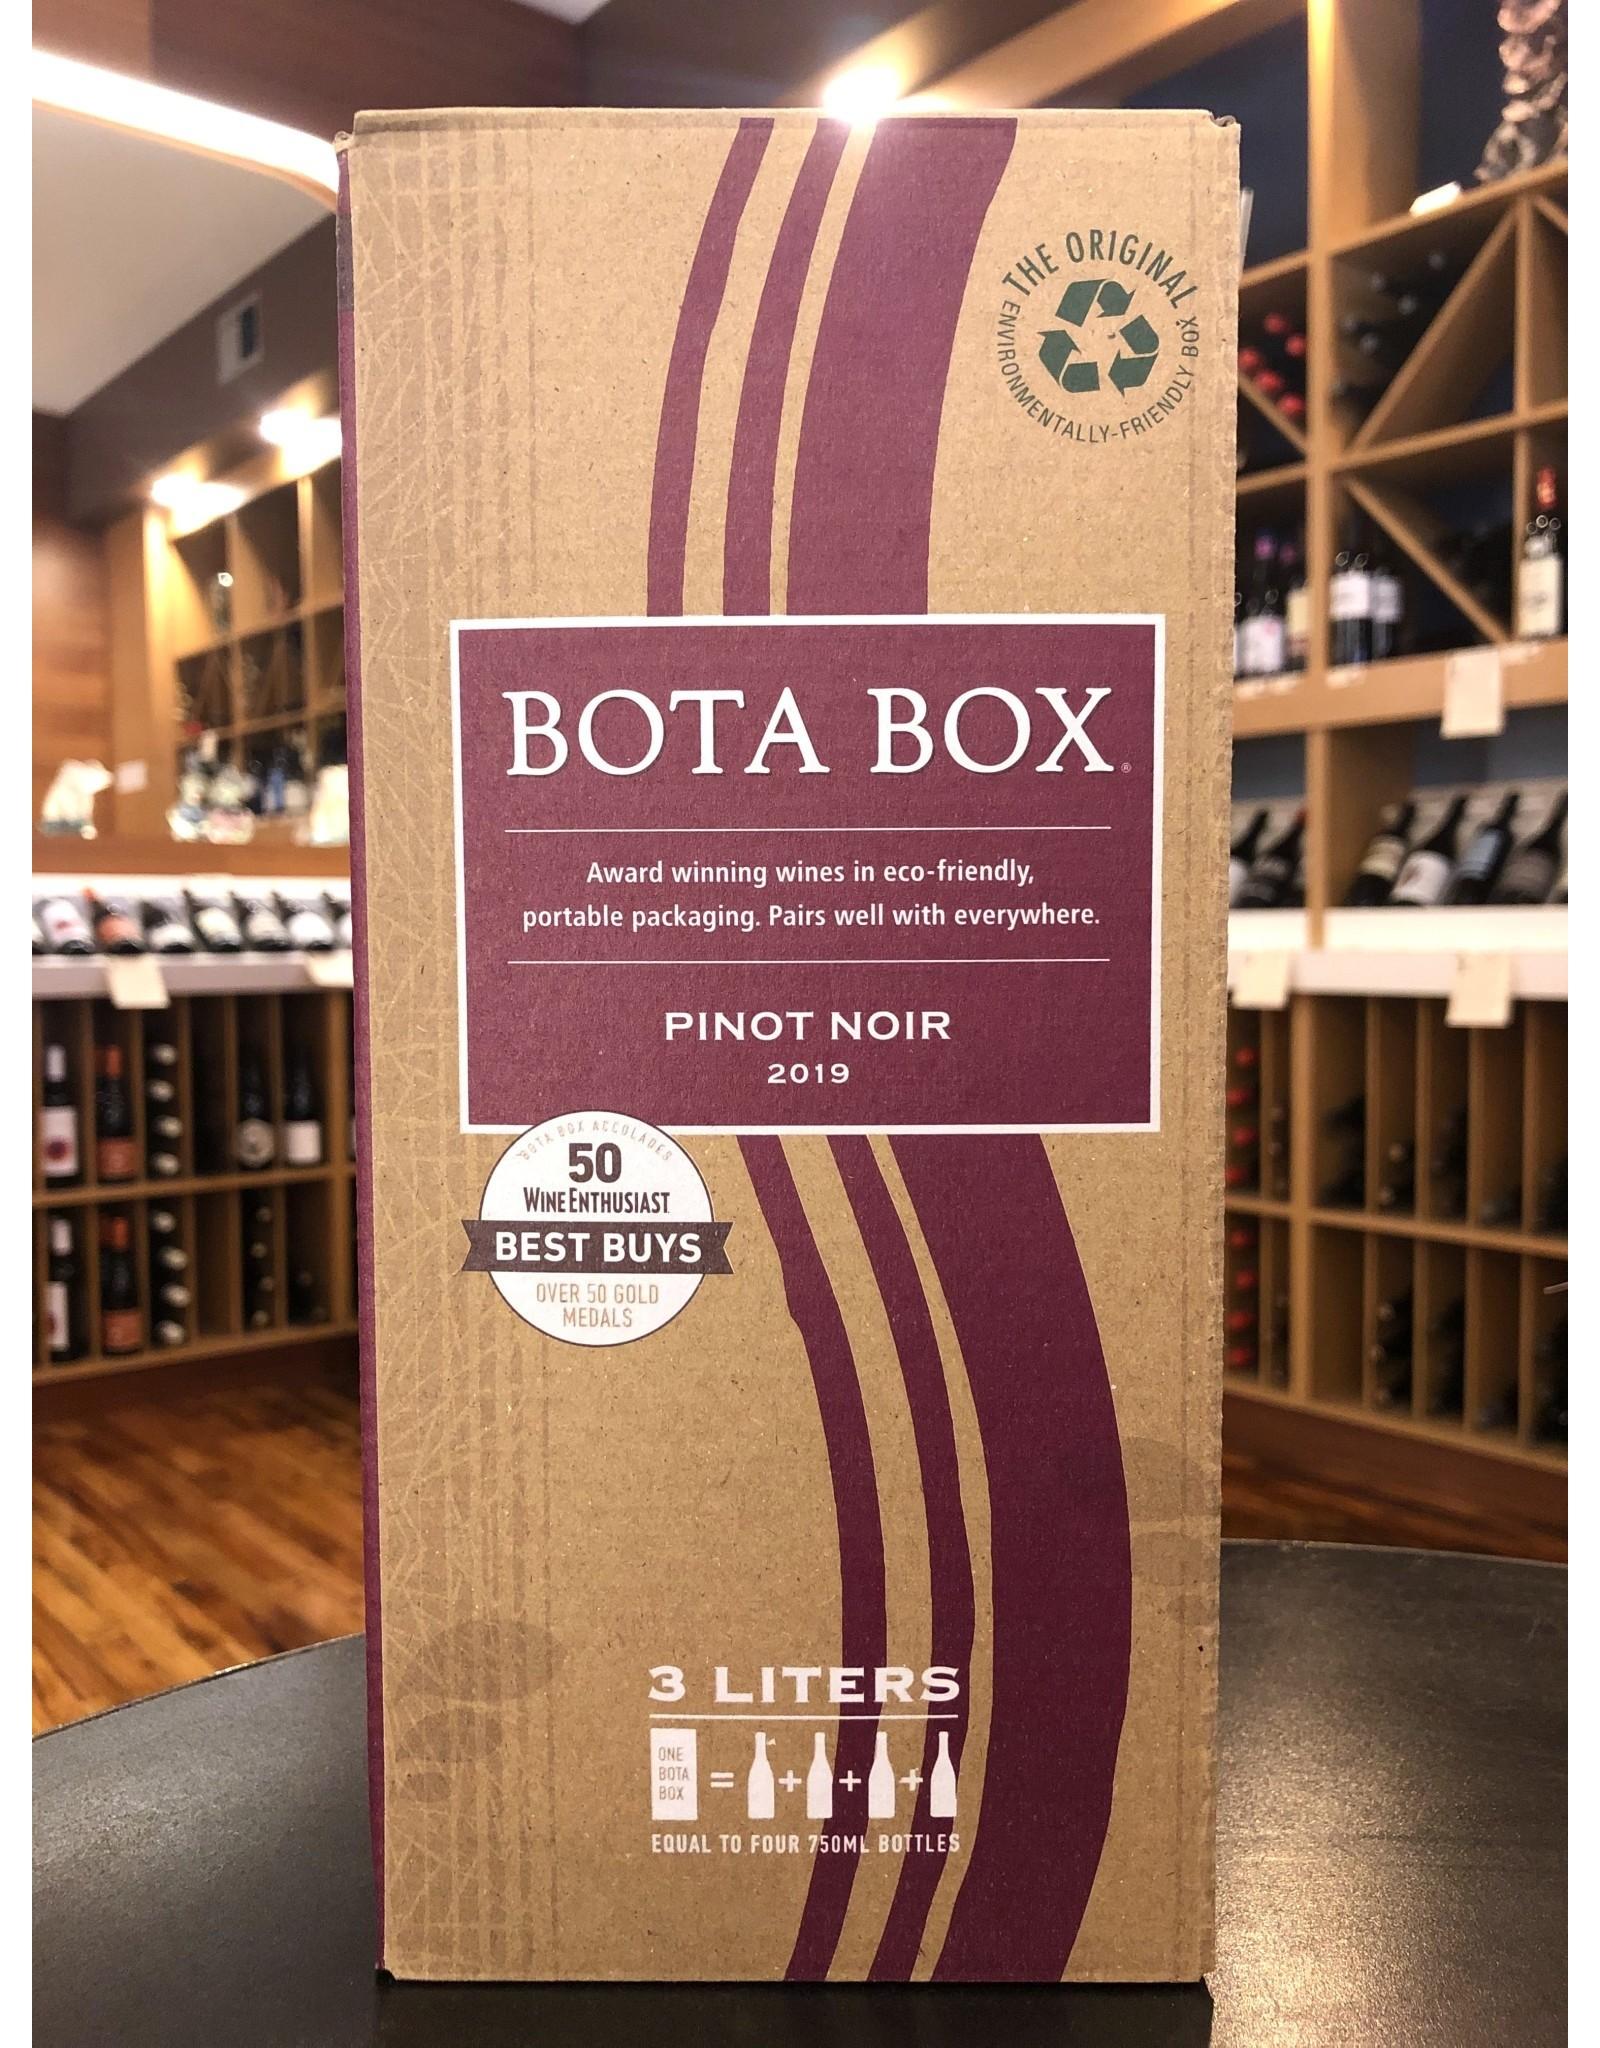 Bota Box Pinot Noir  - 3 Liter